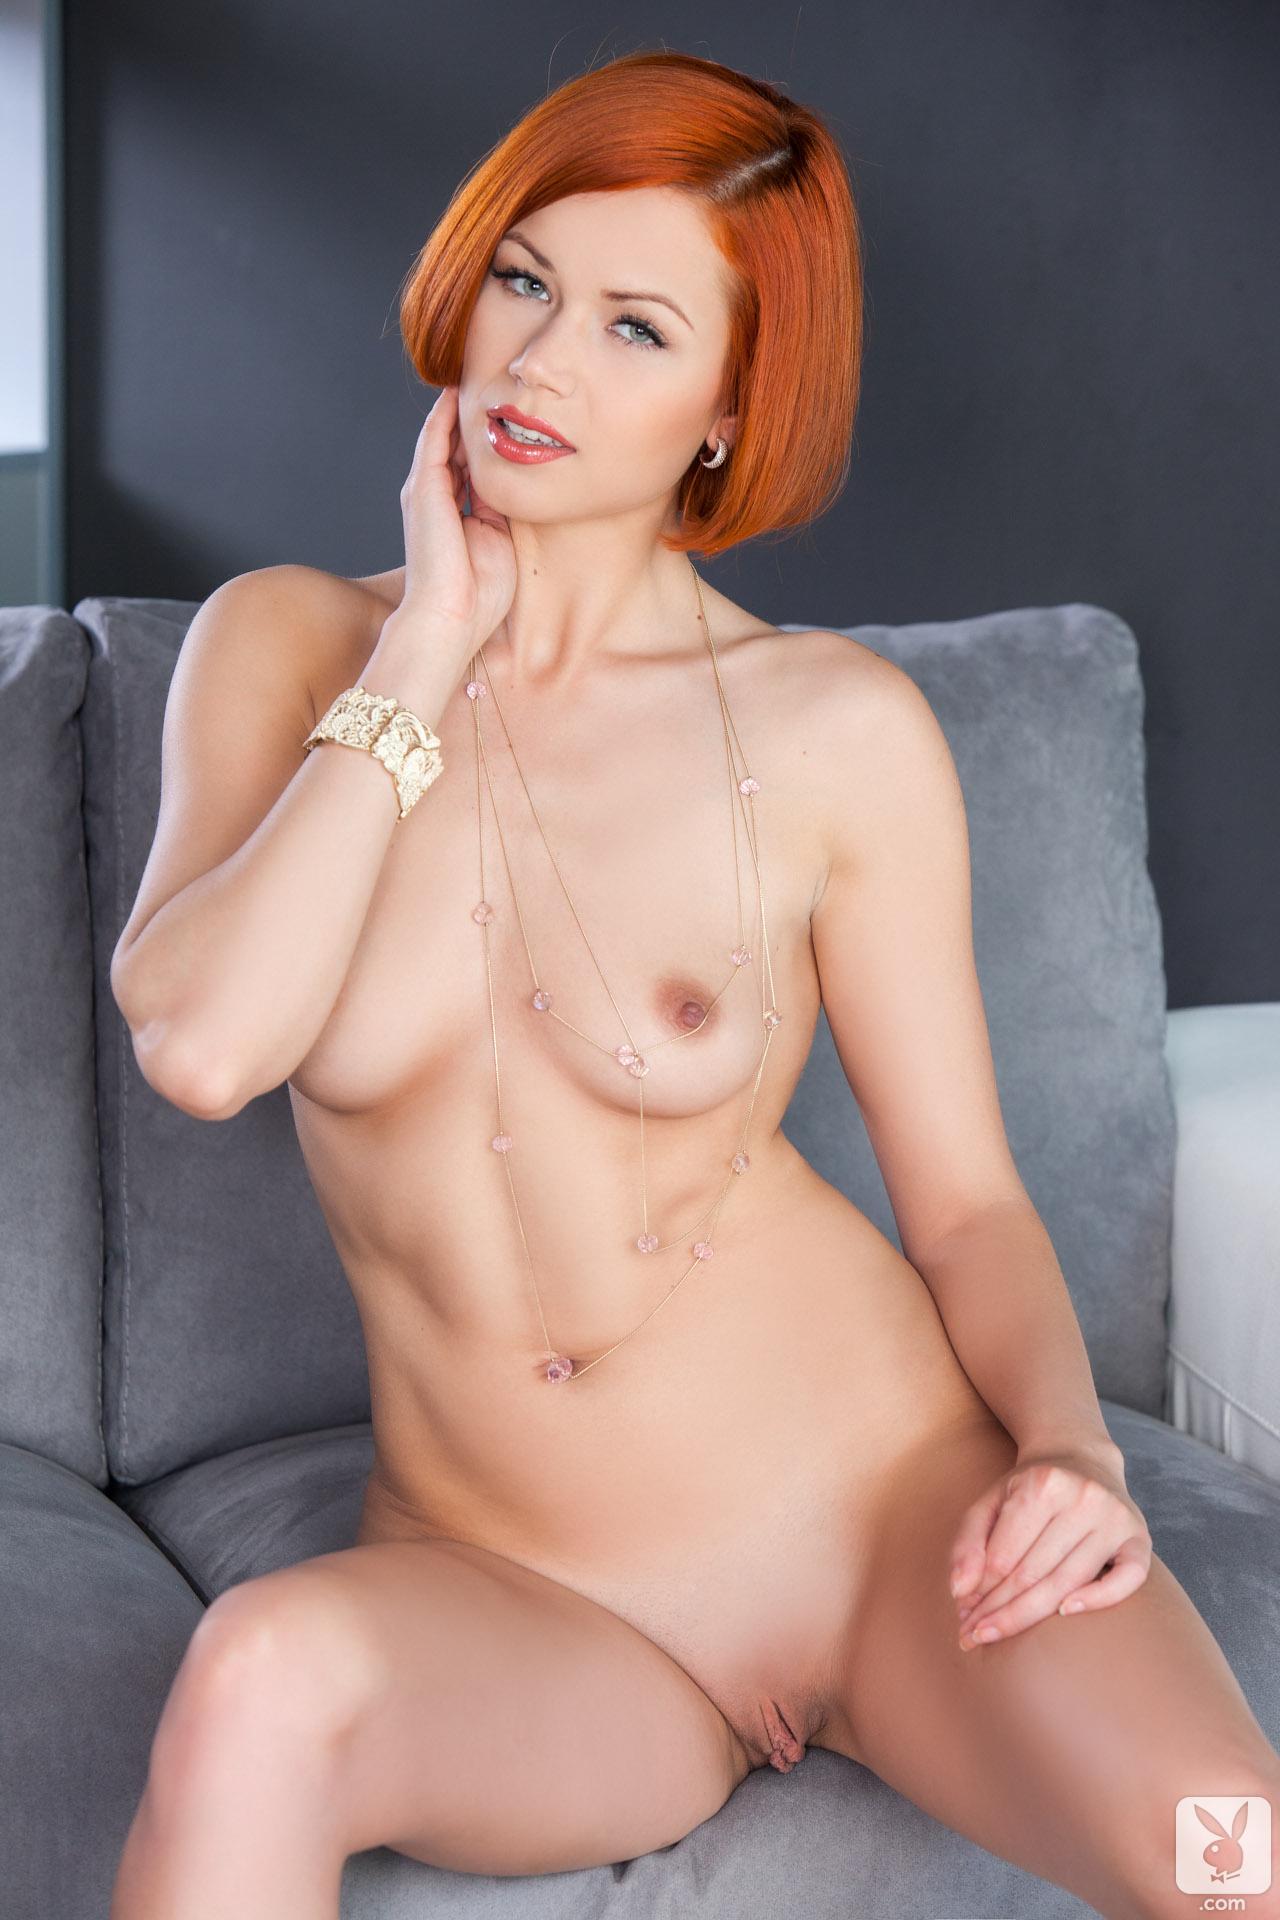 kamila-hermanova-redhead-naked-white-lingerie-playboy-22